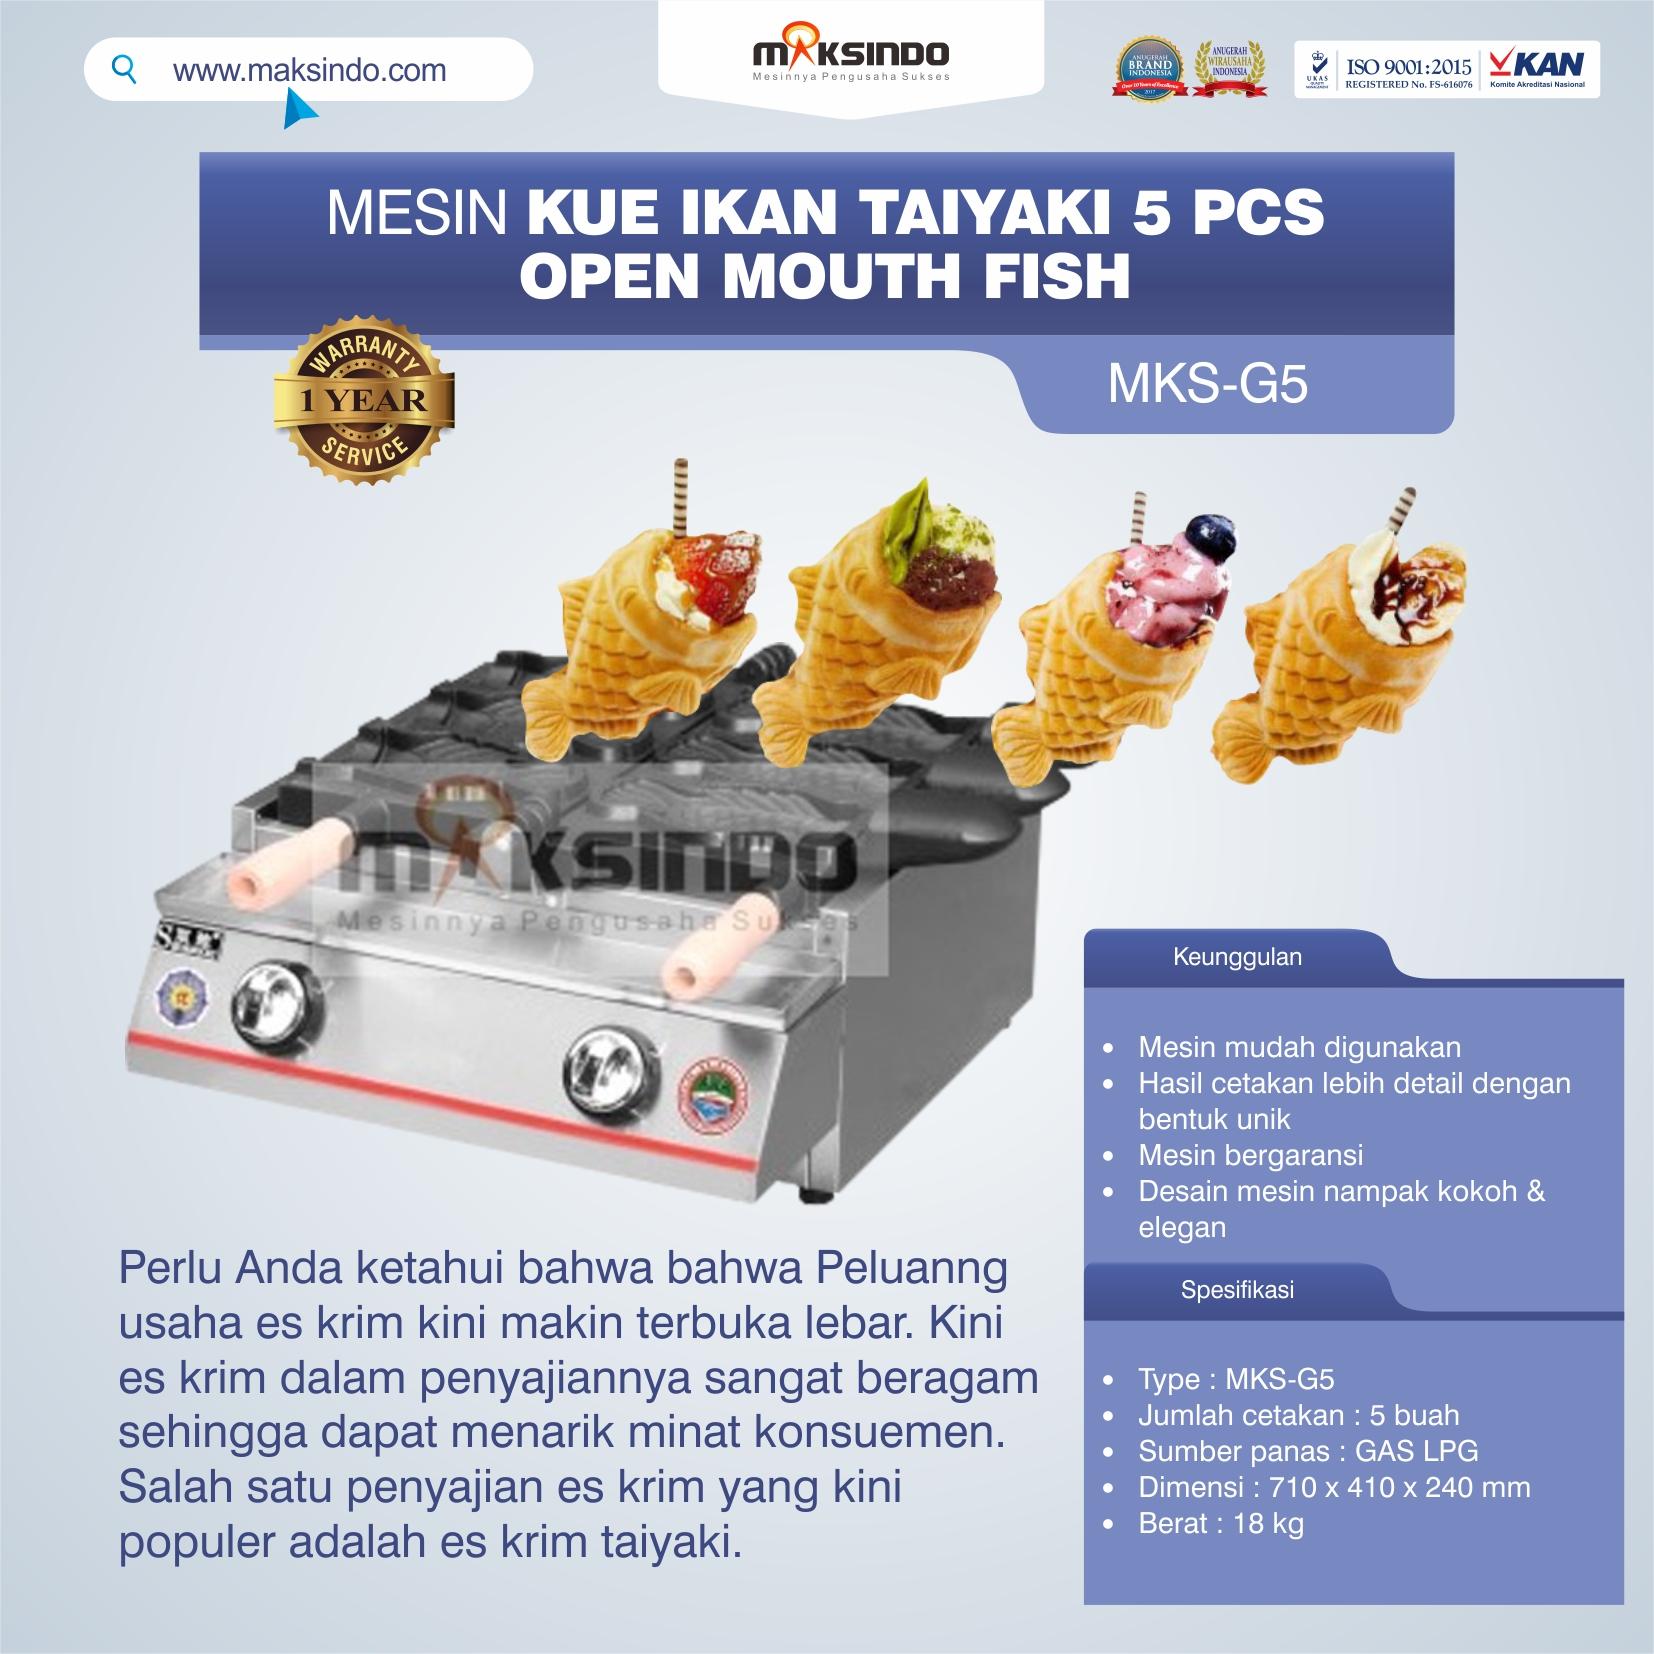 Jual Mesin Kue Ikan Taiyaki 5 Pcs – Open Mouth Fish di Bekasi